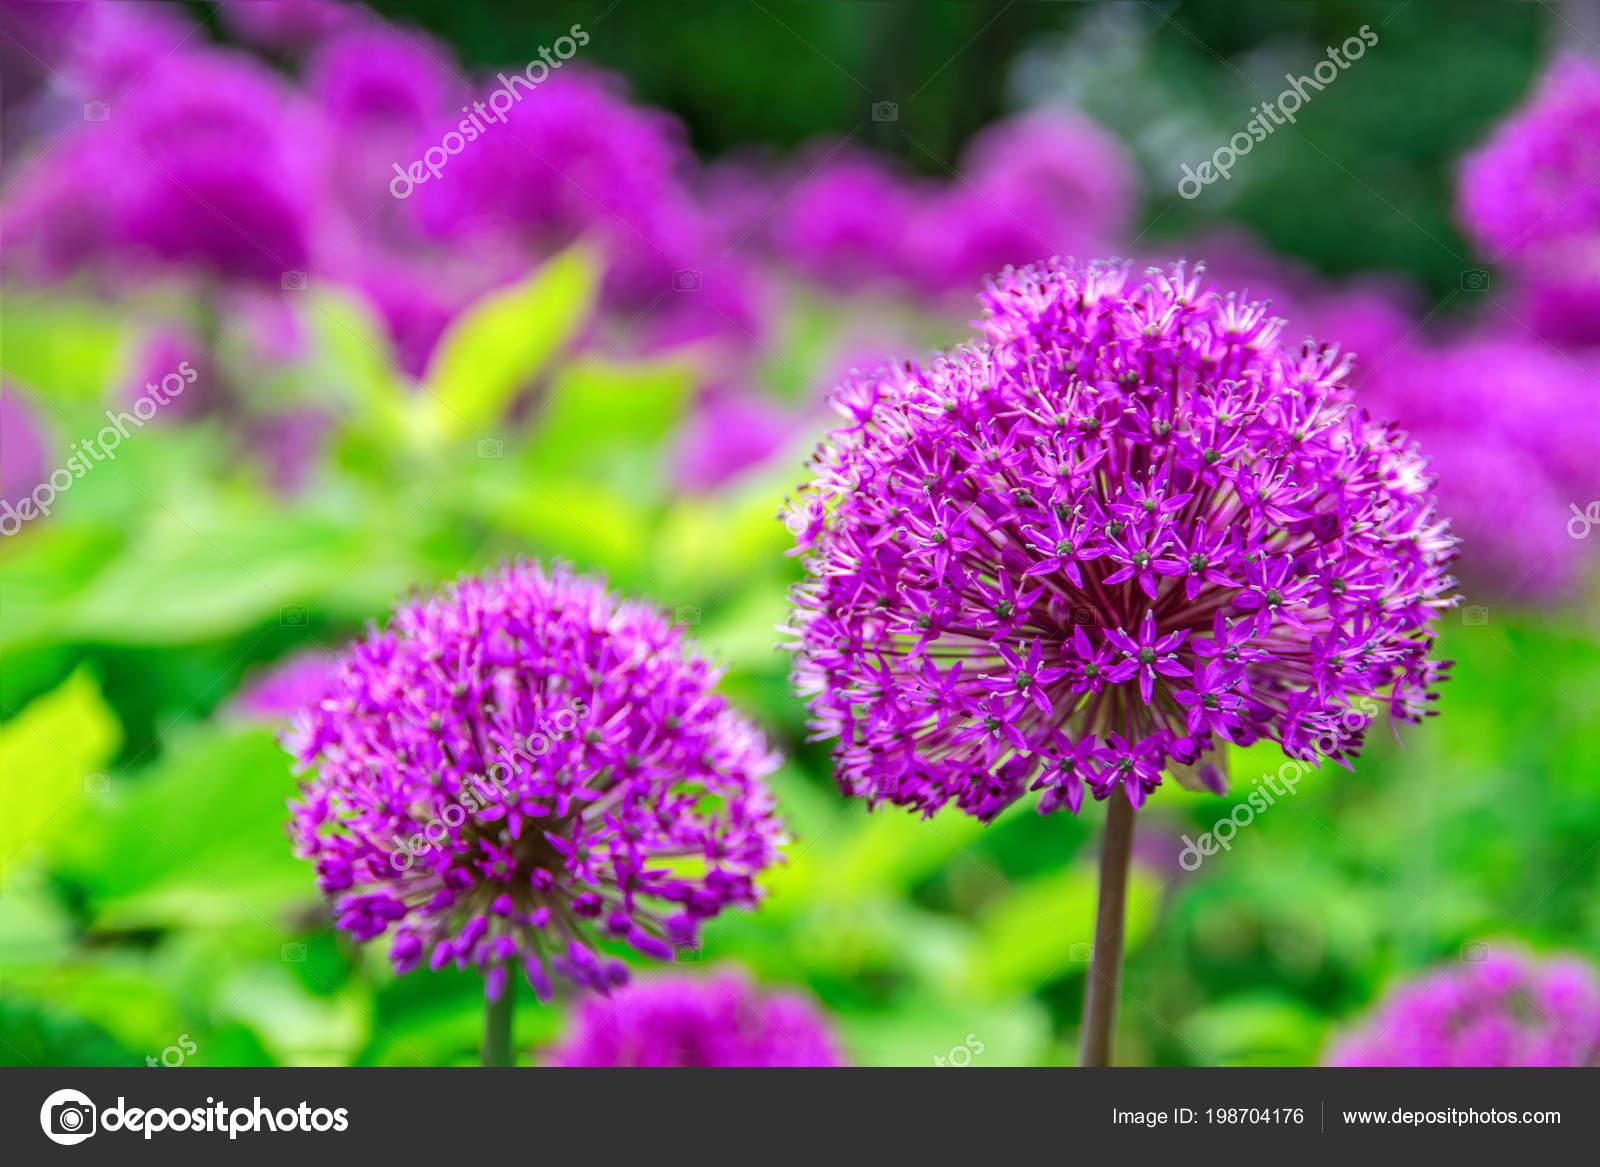 Beautiful flowers of onion allium purple colour garden nature beautiful flowers of onion allium purple colour grass garden nature spring globe like flower heads vibrant purple flower in full blossom izmirmasajfo